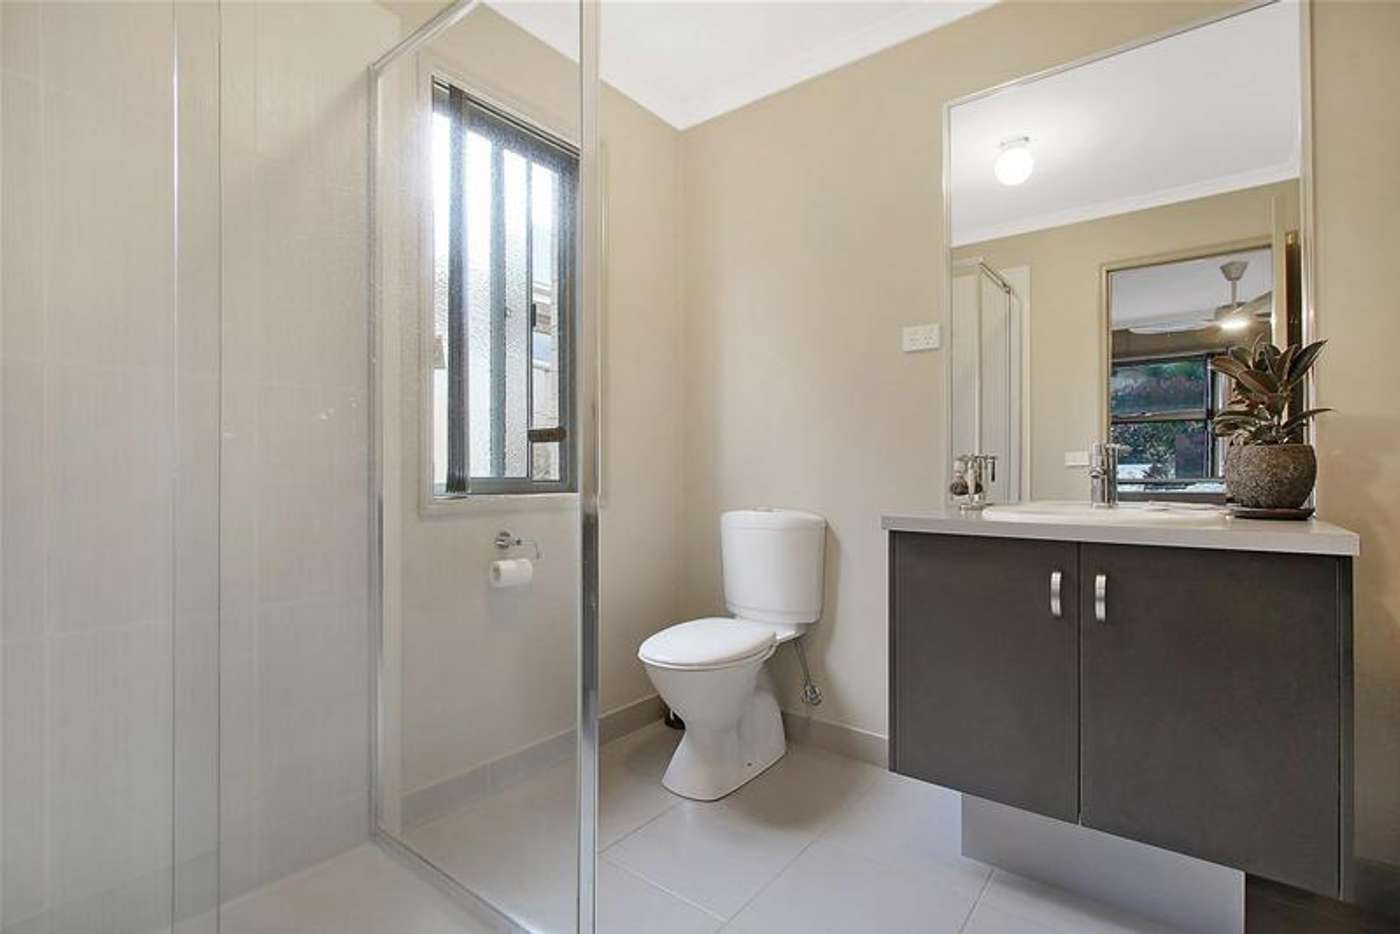 Sixth view of Homely house listing, 91 Yarralumla Drive, Wodonga VIC 3690